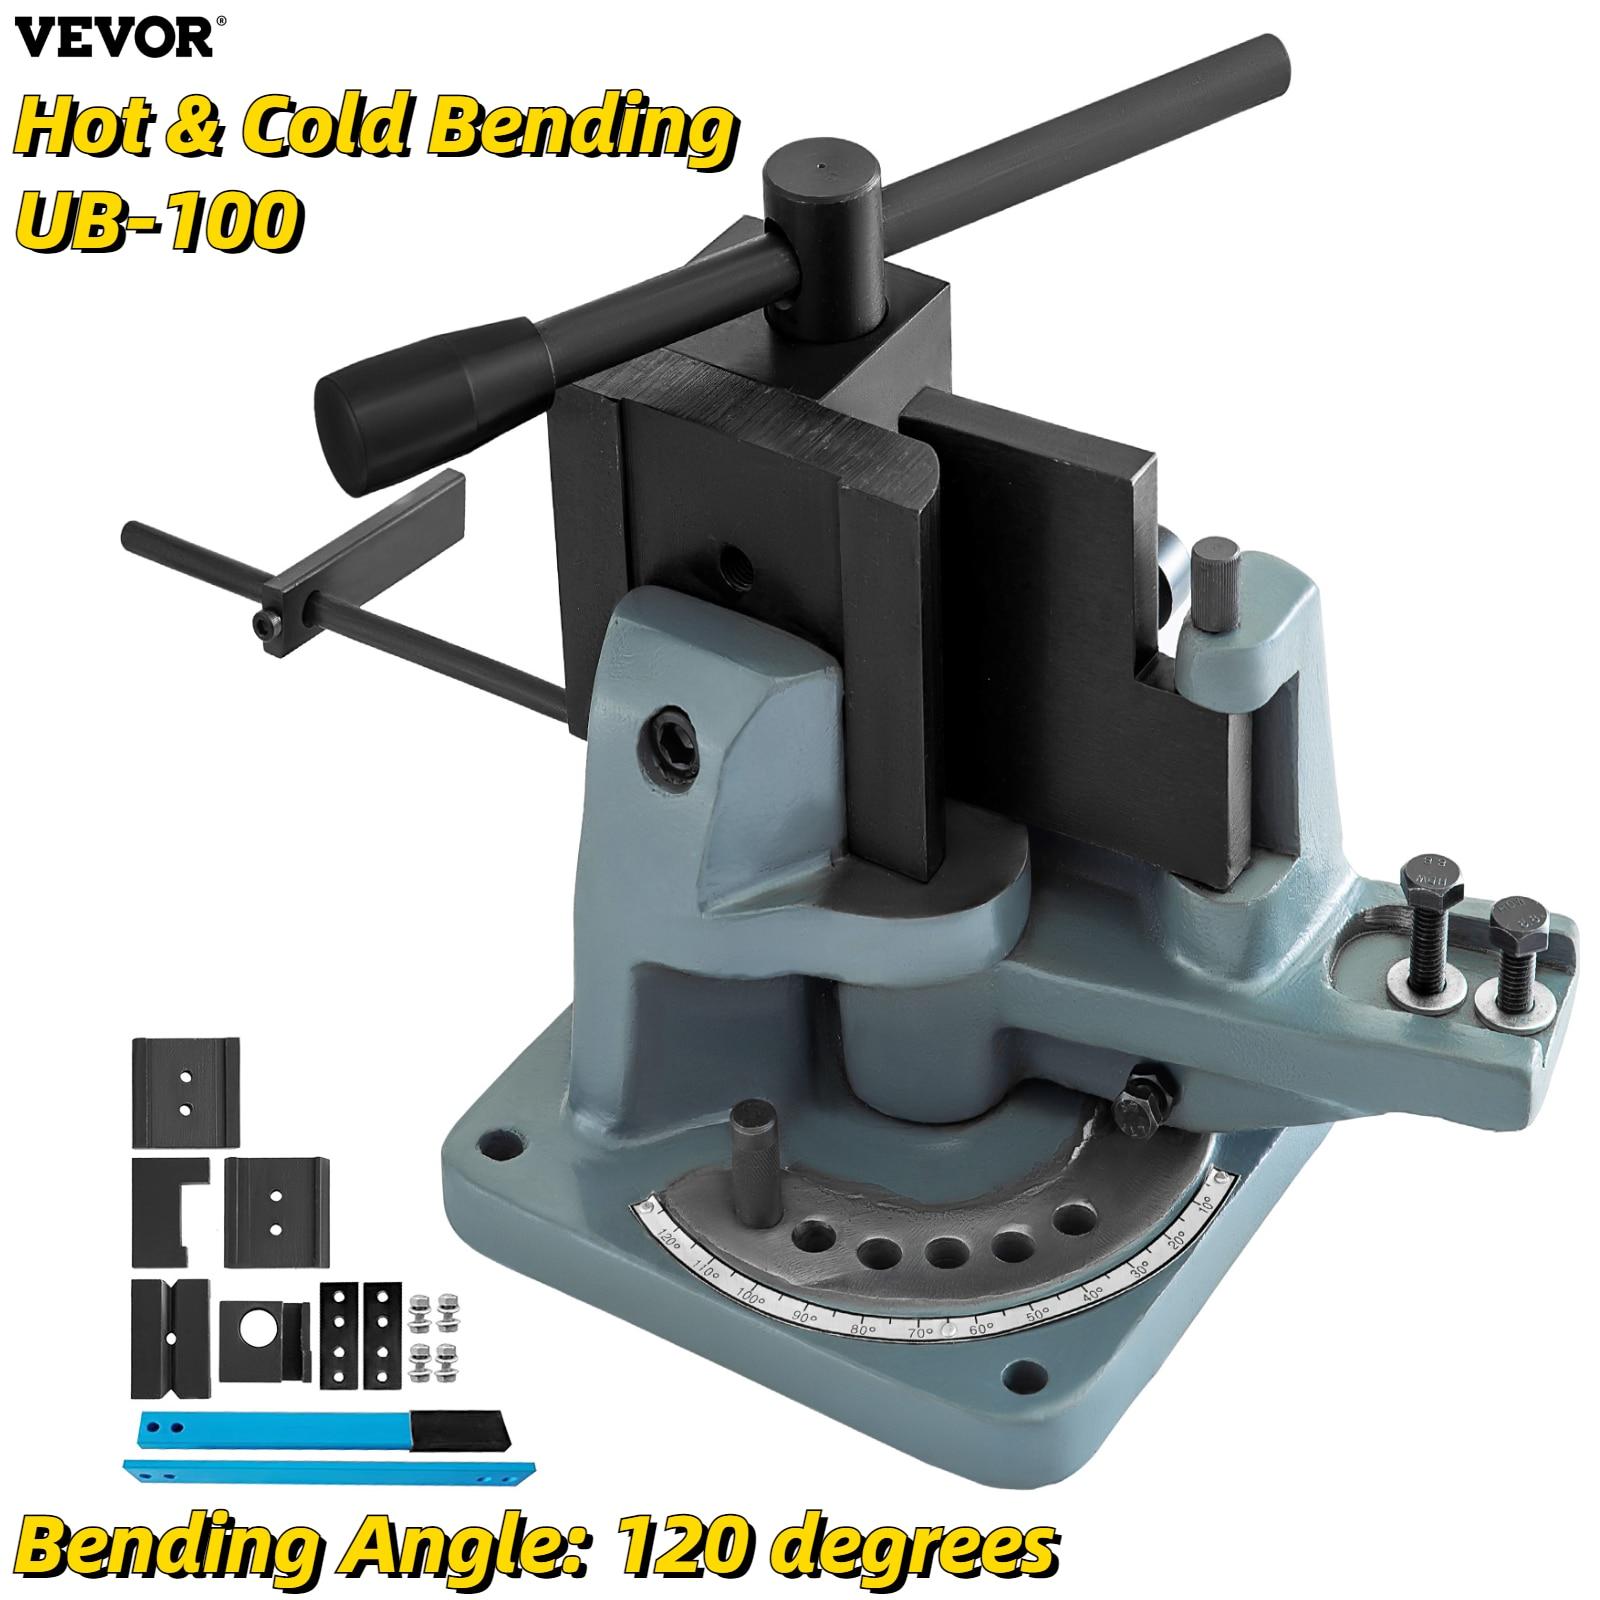 VEVOR دليل العالمي بندر UB-100 انفصال رافعة الساخن Cold شقة زاوية مستديرة الصلب الانحناء 120 درجة التعميم الانحناء أداة